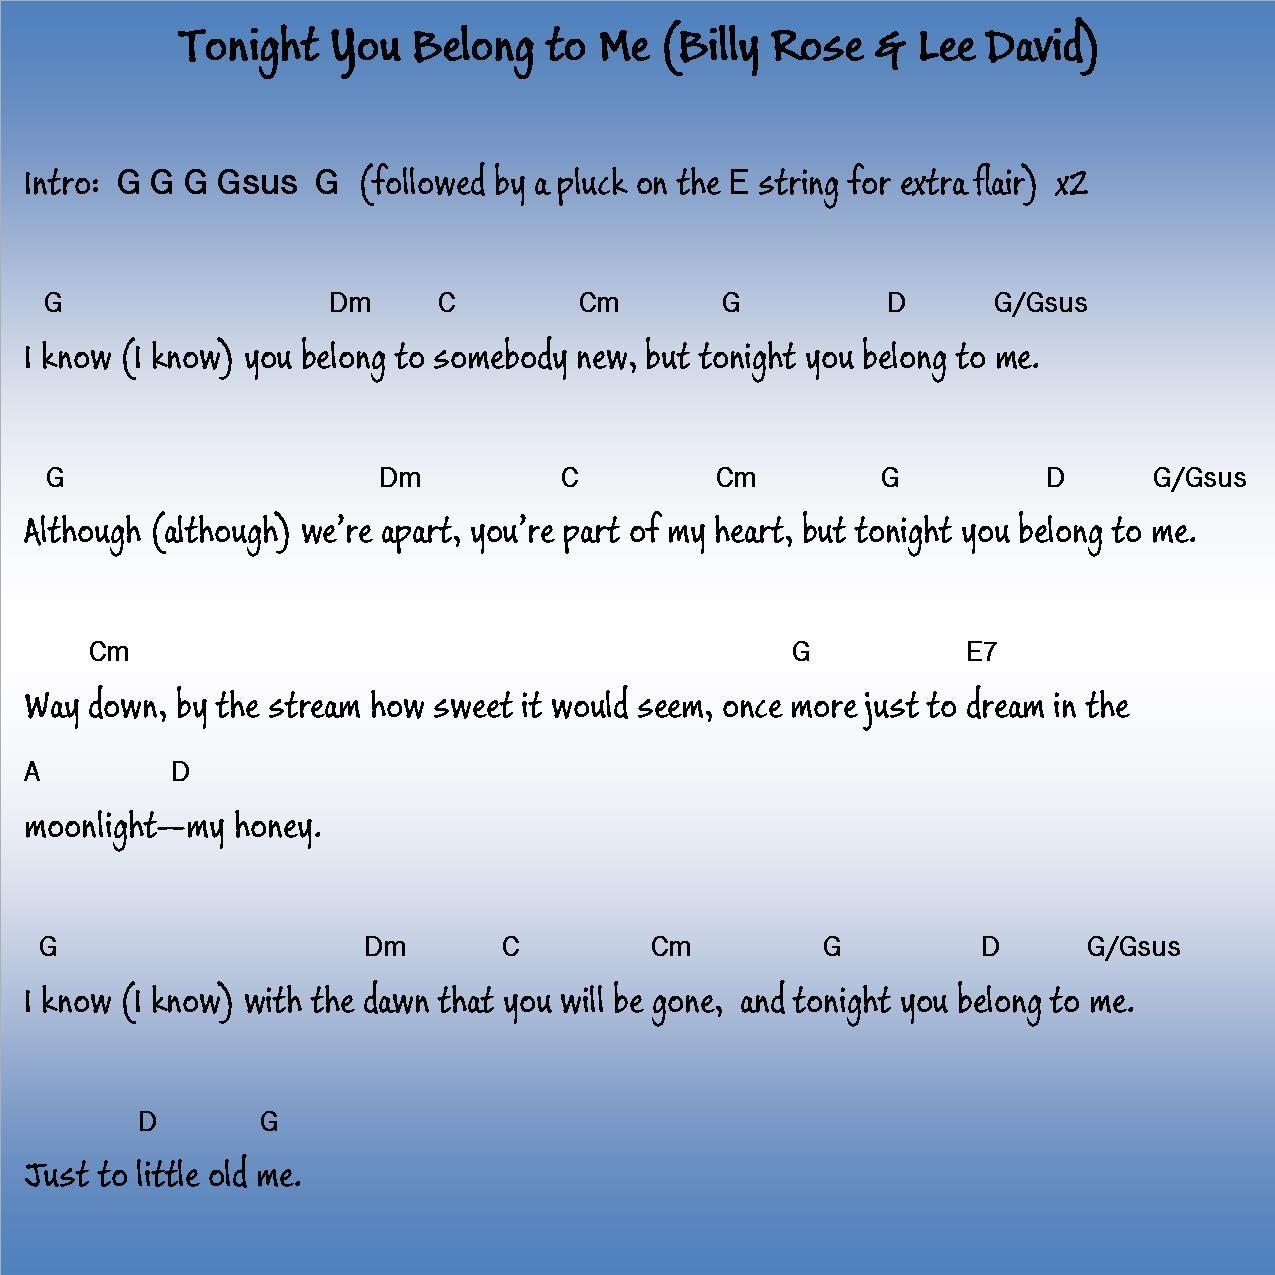 Tonight You Belong to Me   Ukulele songs, Ukulele, You belong